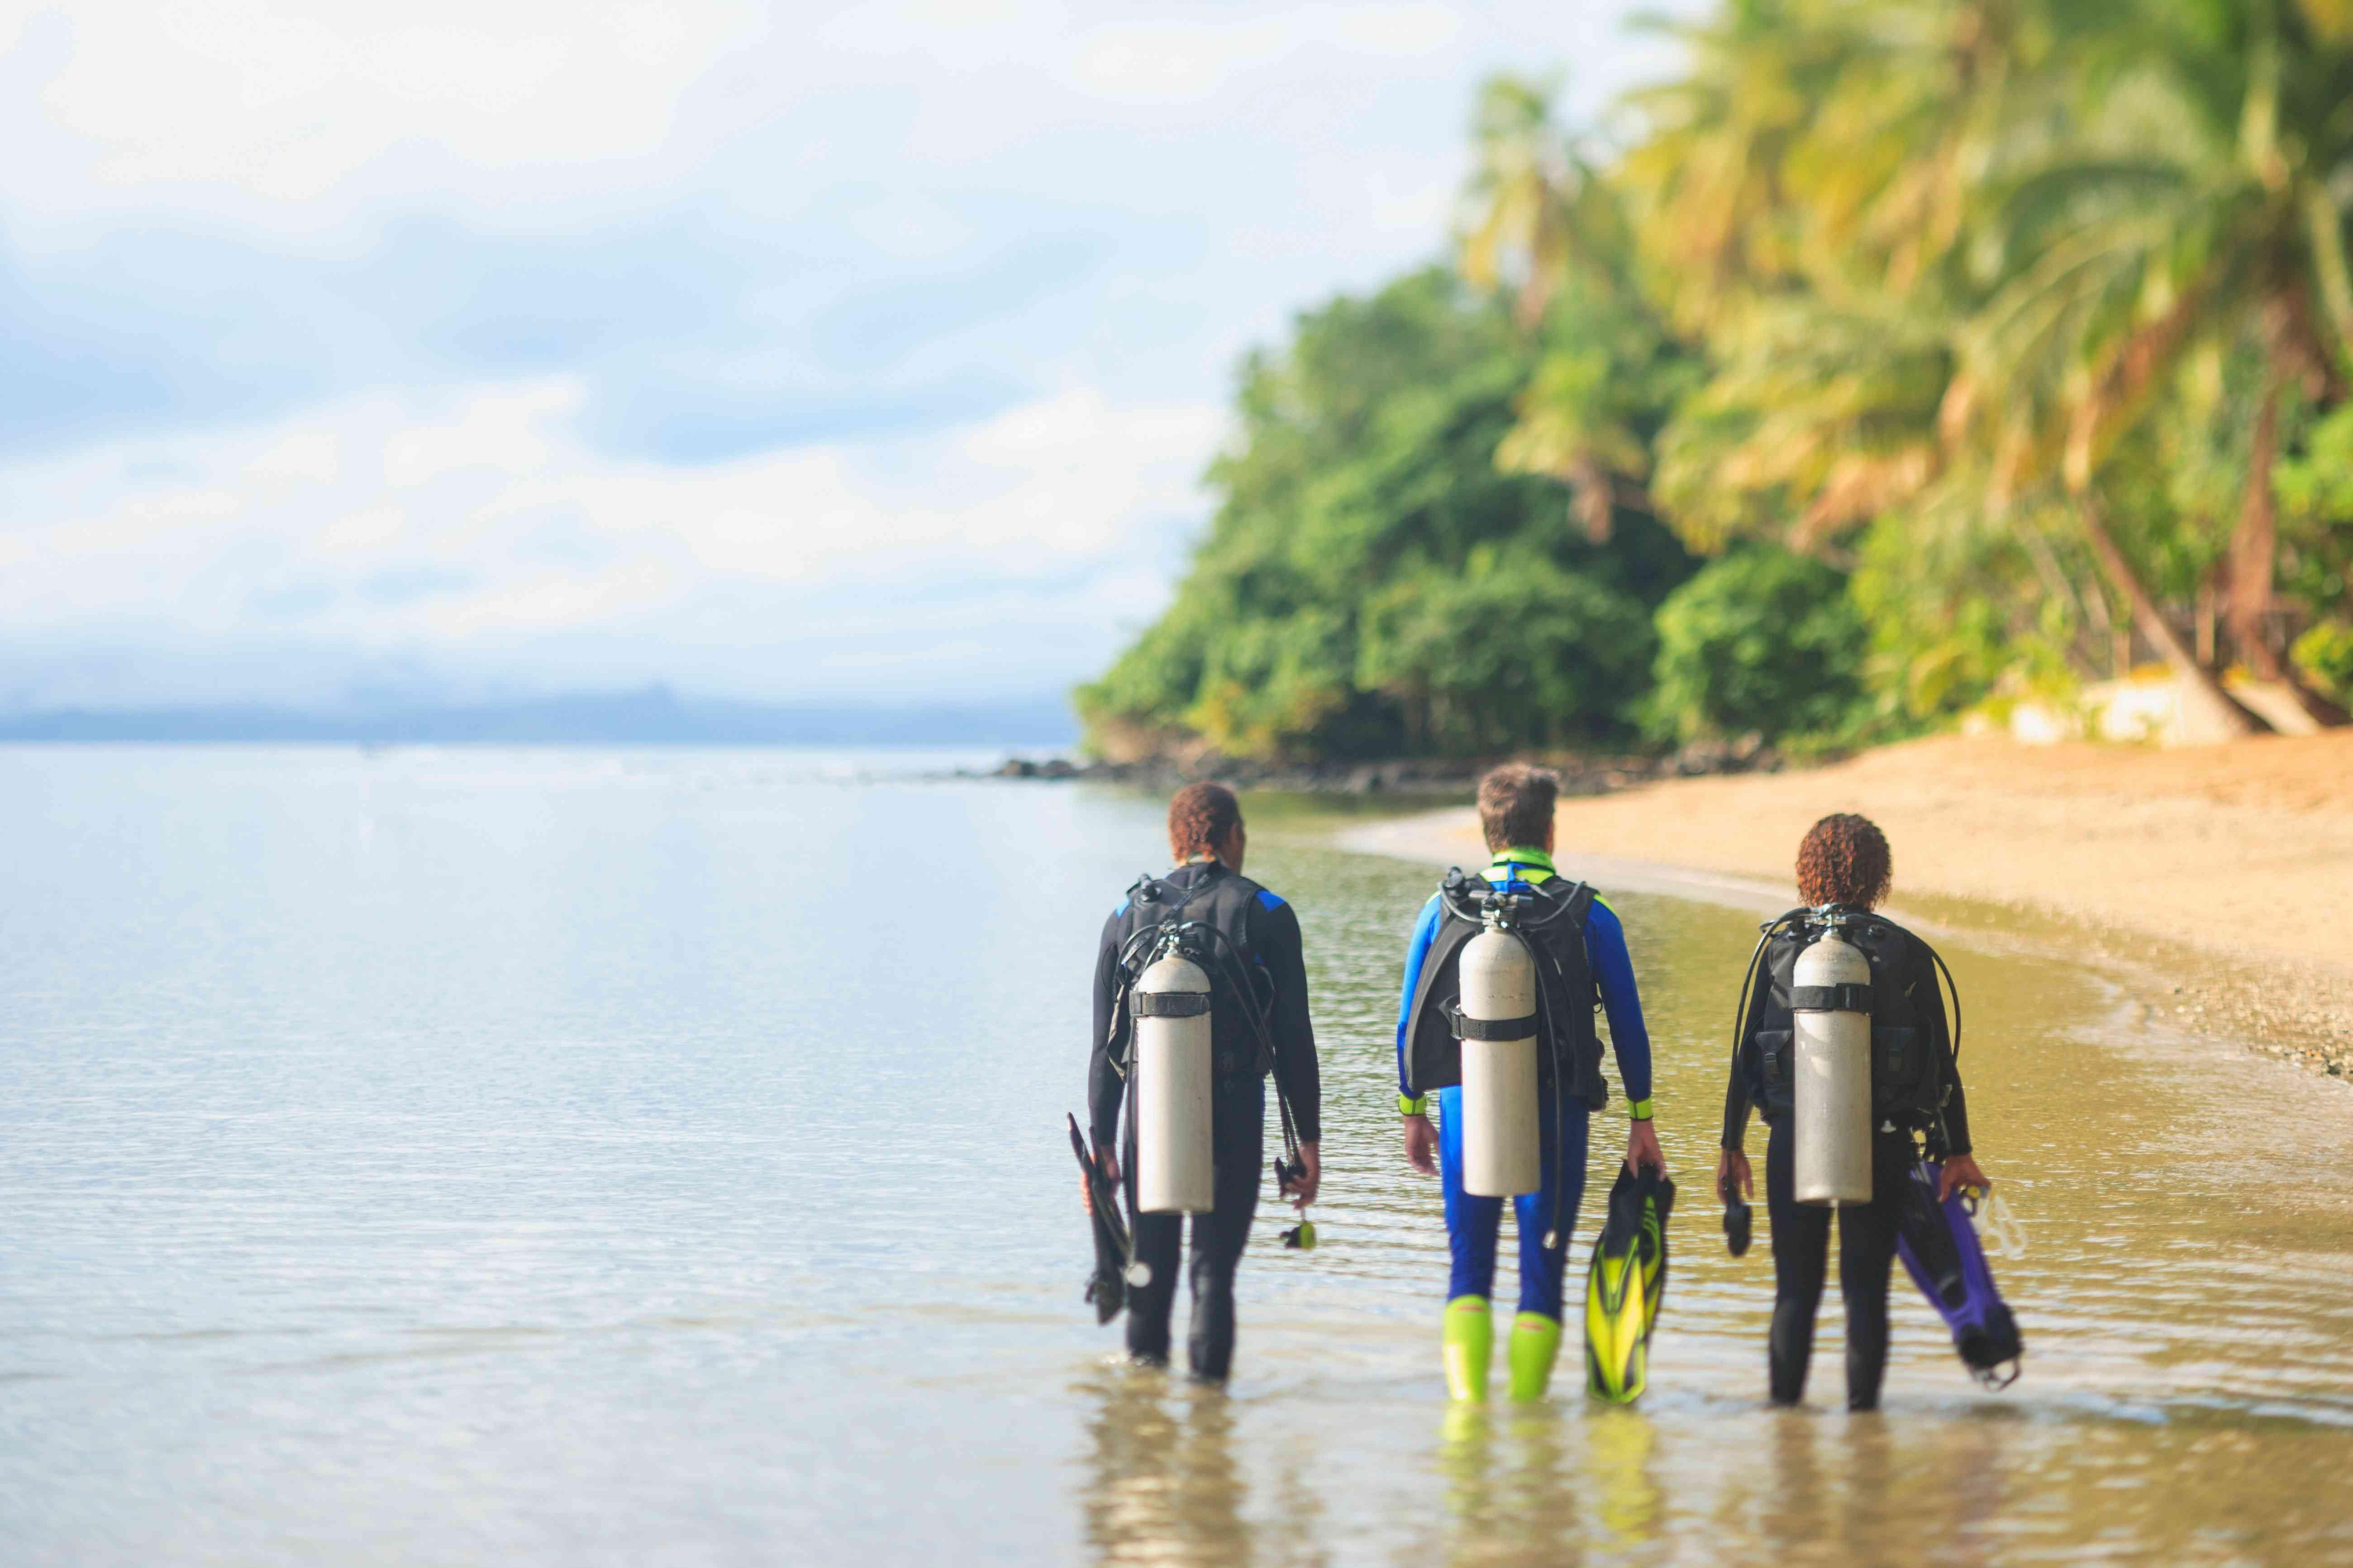 Scuba divers walking on tropical beach